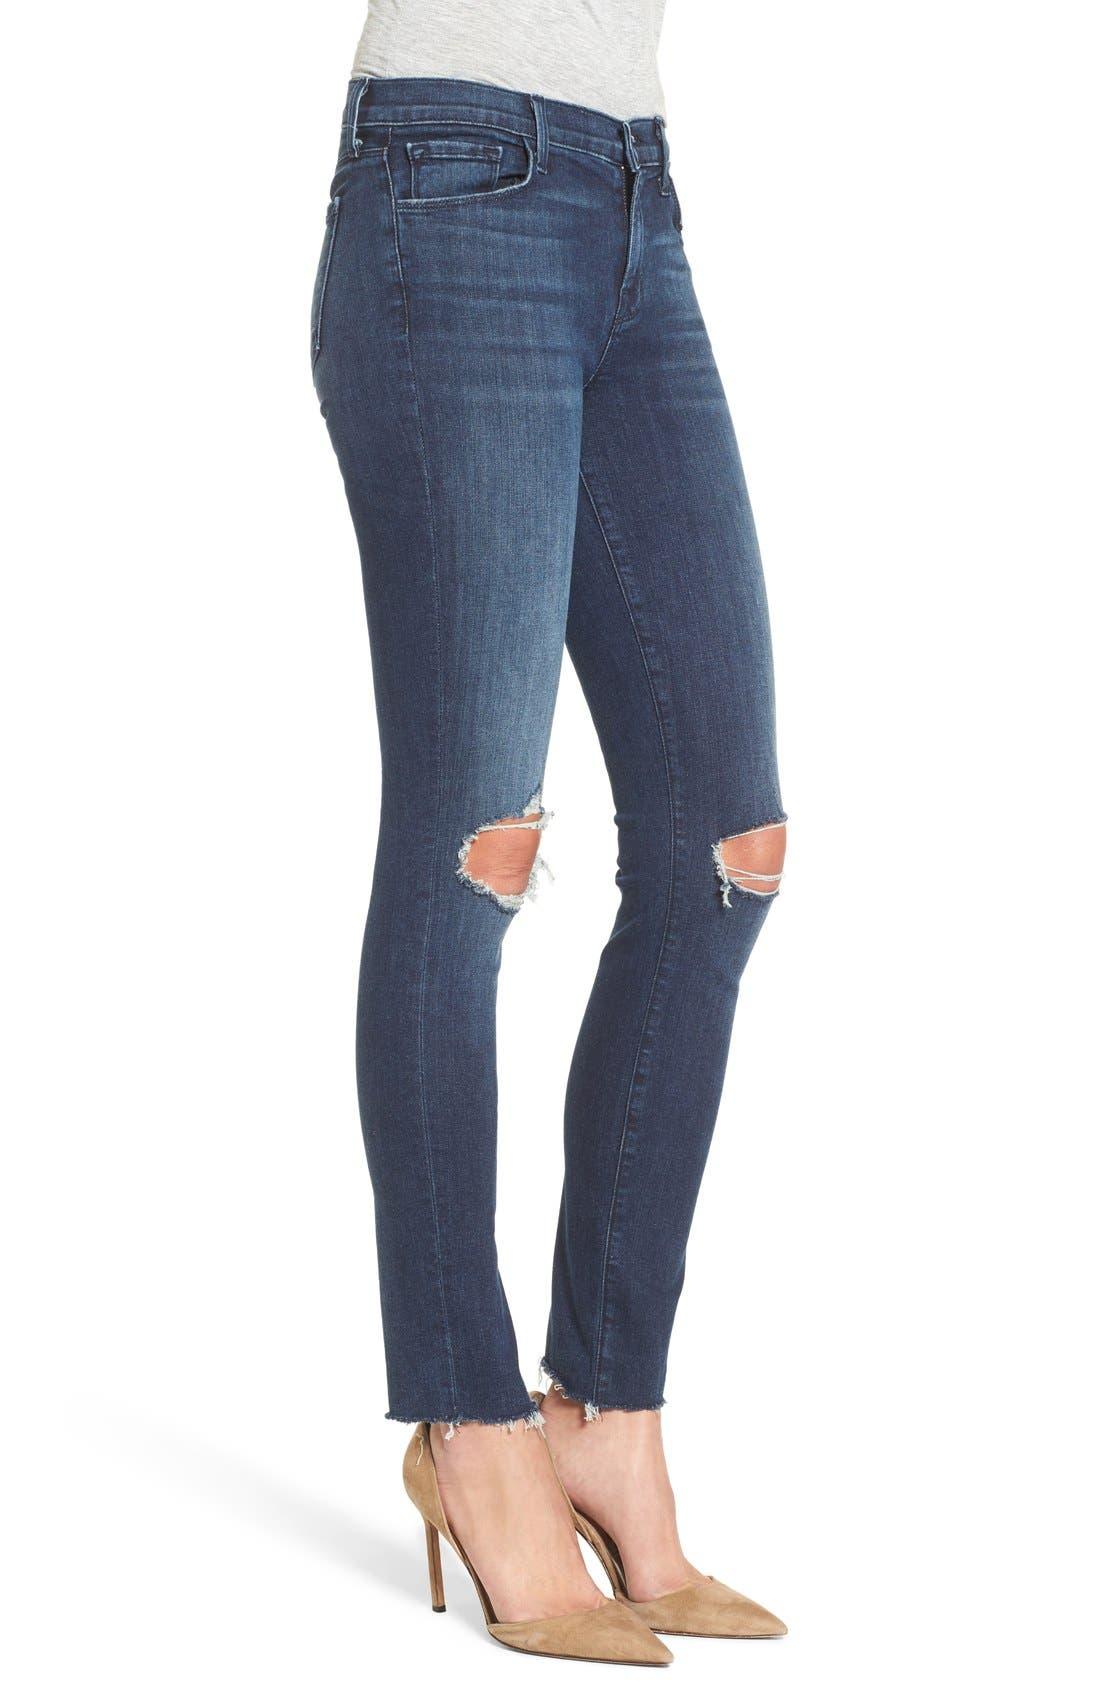 J BRAND, '811' Ankle Skinny Jeans, Alternate thumbnail 2, color, 401